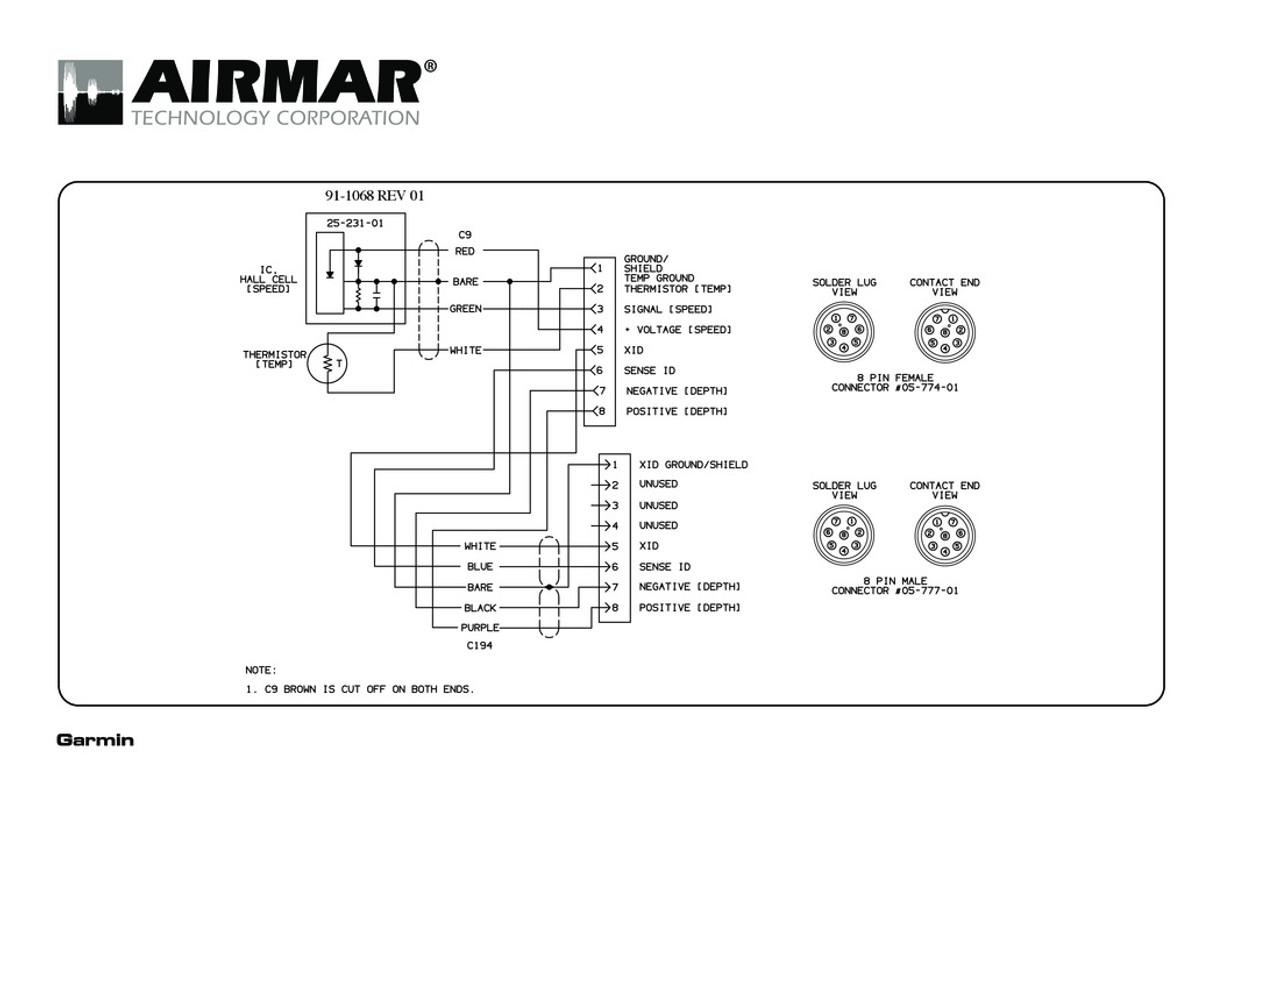 hight resolution of airmar wiring diagram garmin st850 8 pin s t blue bottle marine mirror